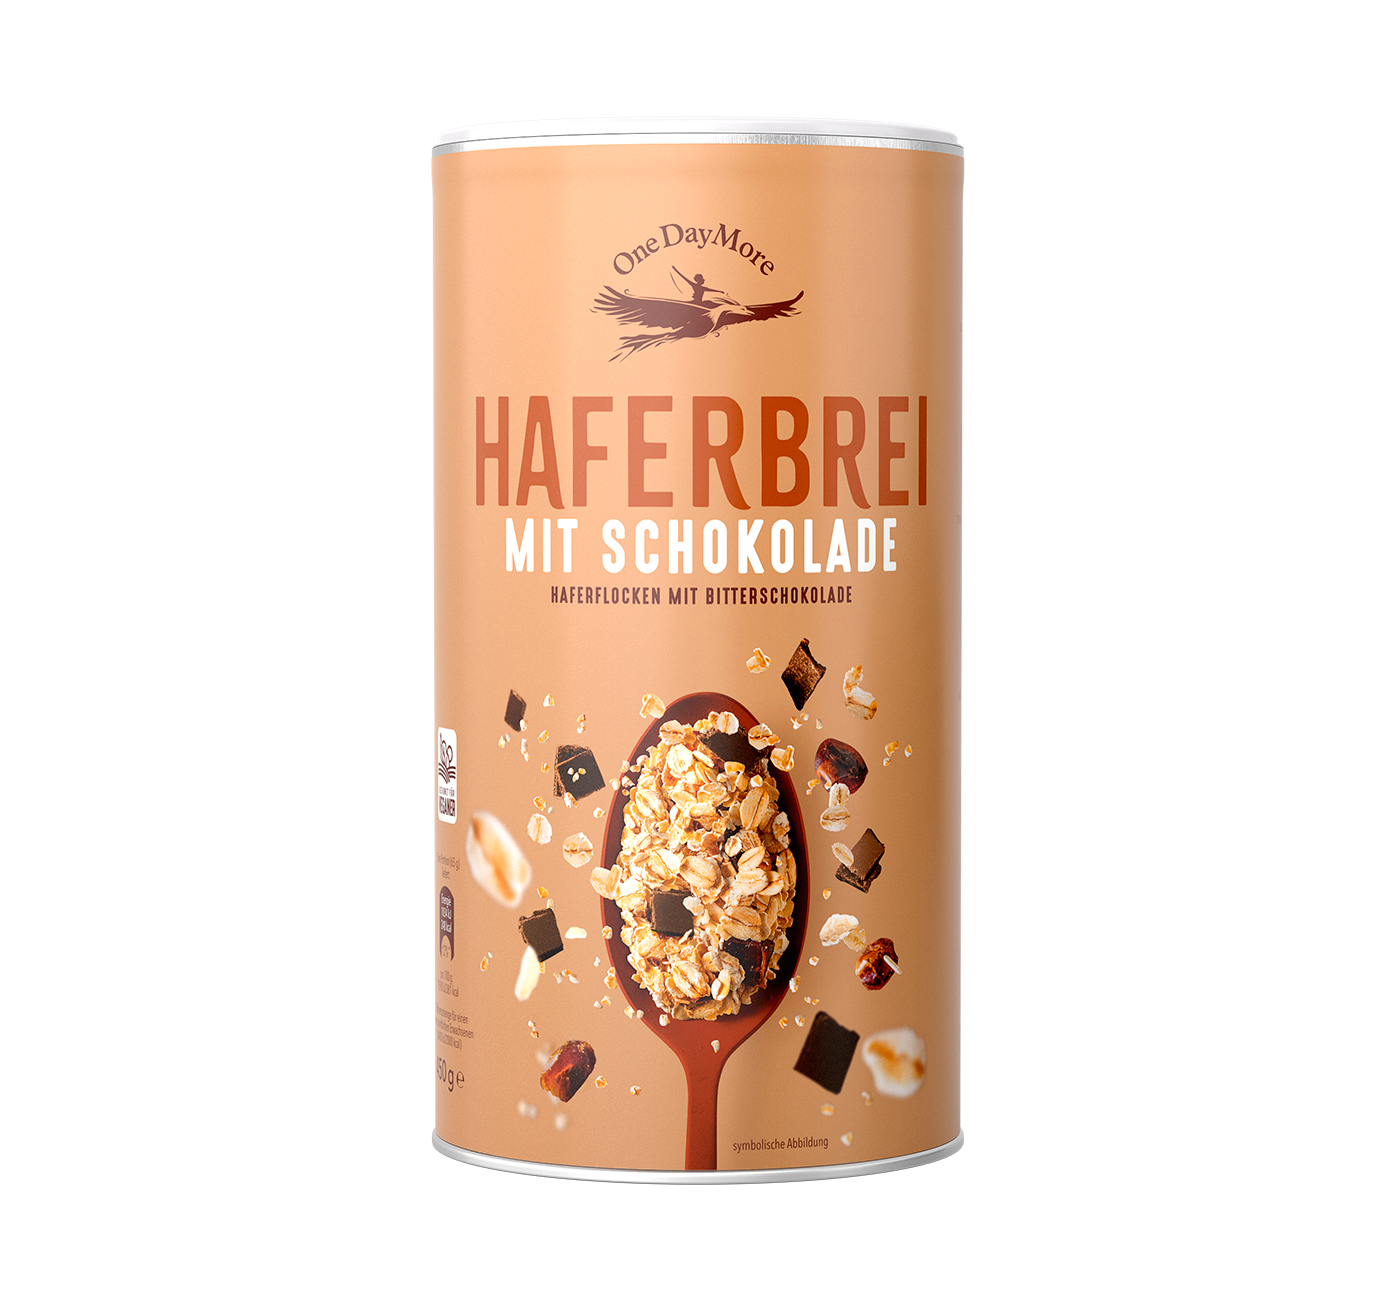 haferbrei-mit-schokolade-musli-onedaymore-tuba-front-1400×1291